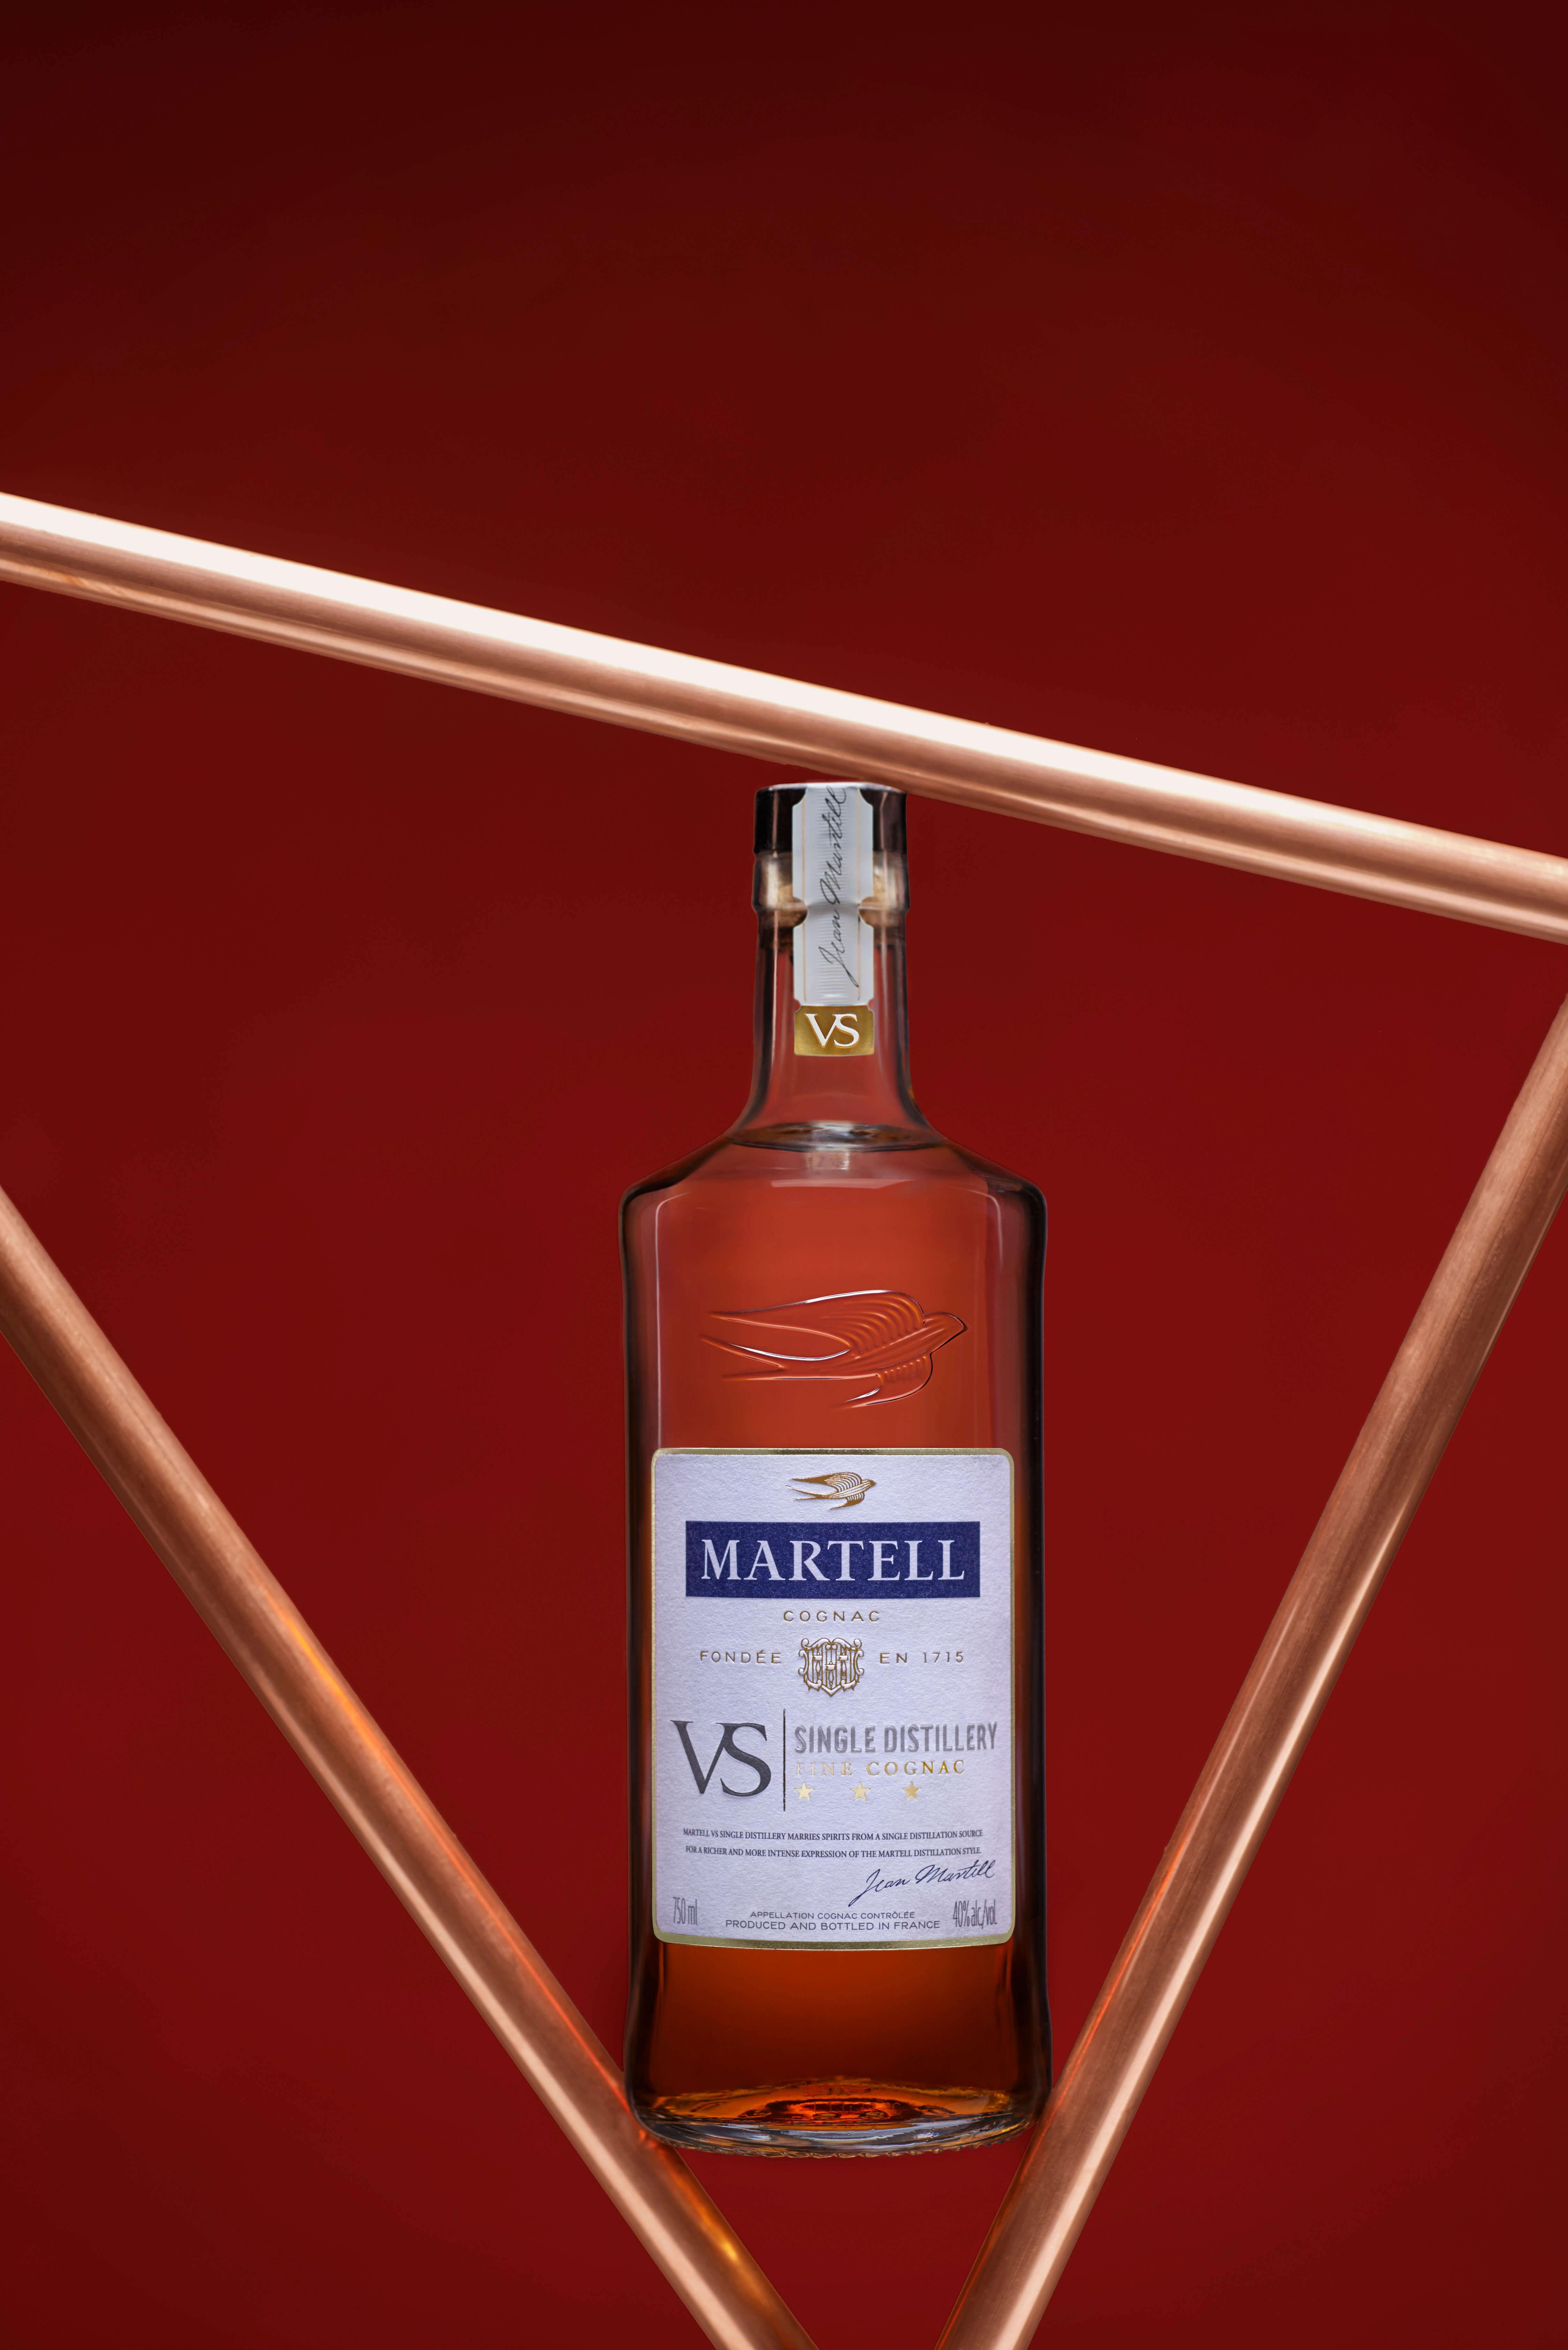 martell-vs-single-distillery-digital-picture-raw-visual-1